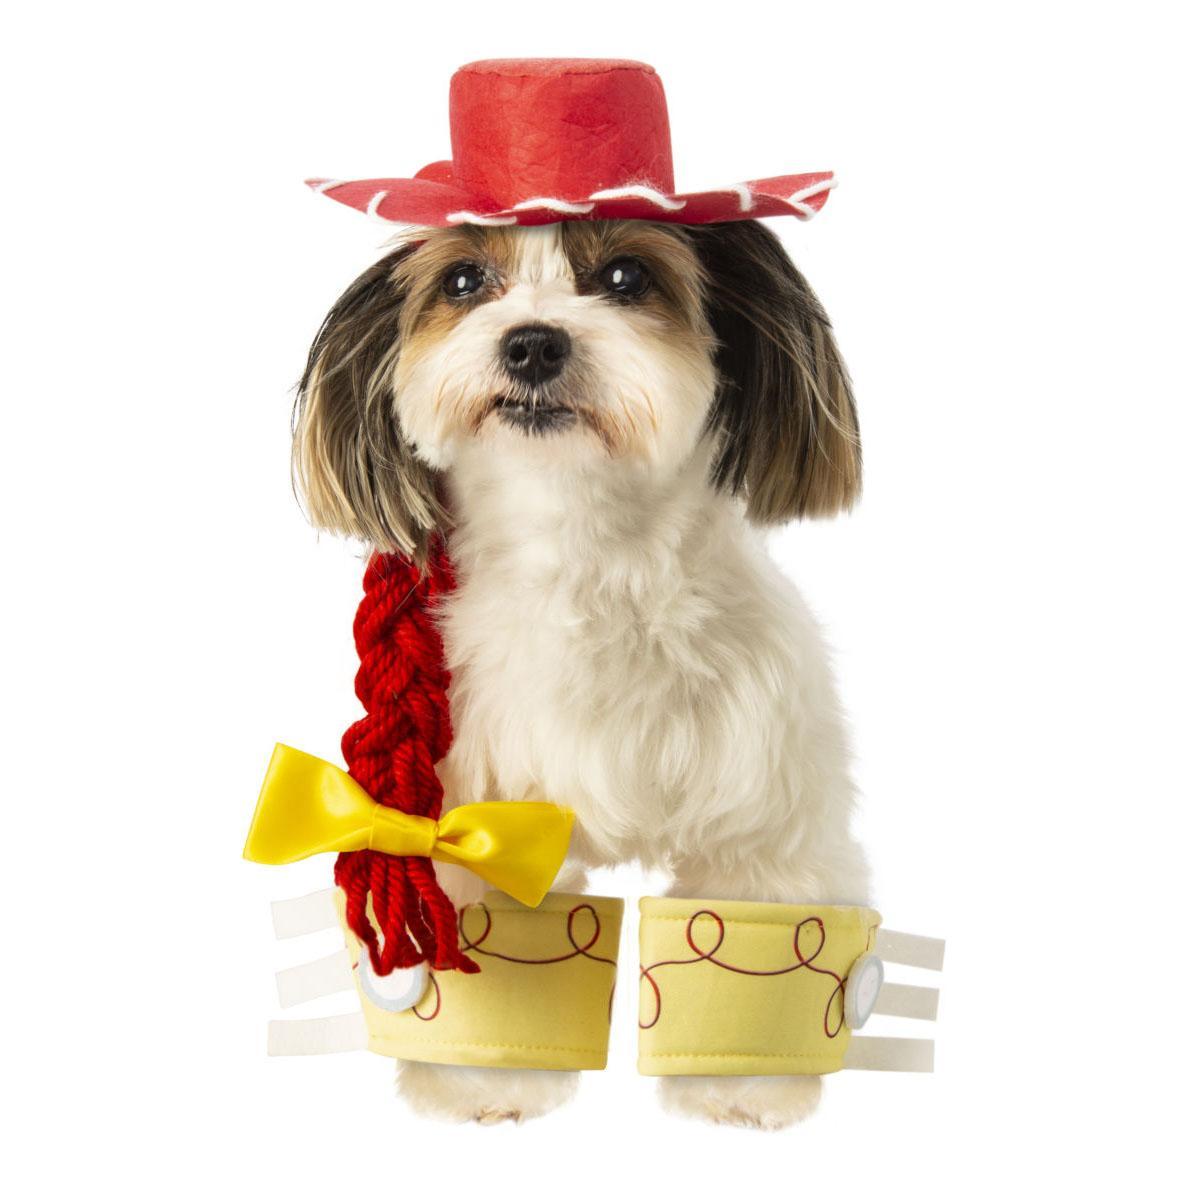 Toy Story Jessie Pet Costume Accessory Set